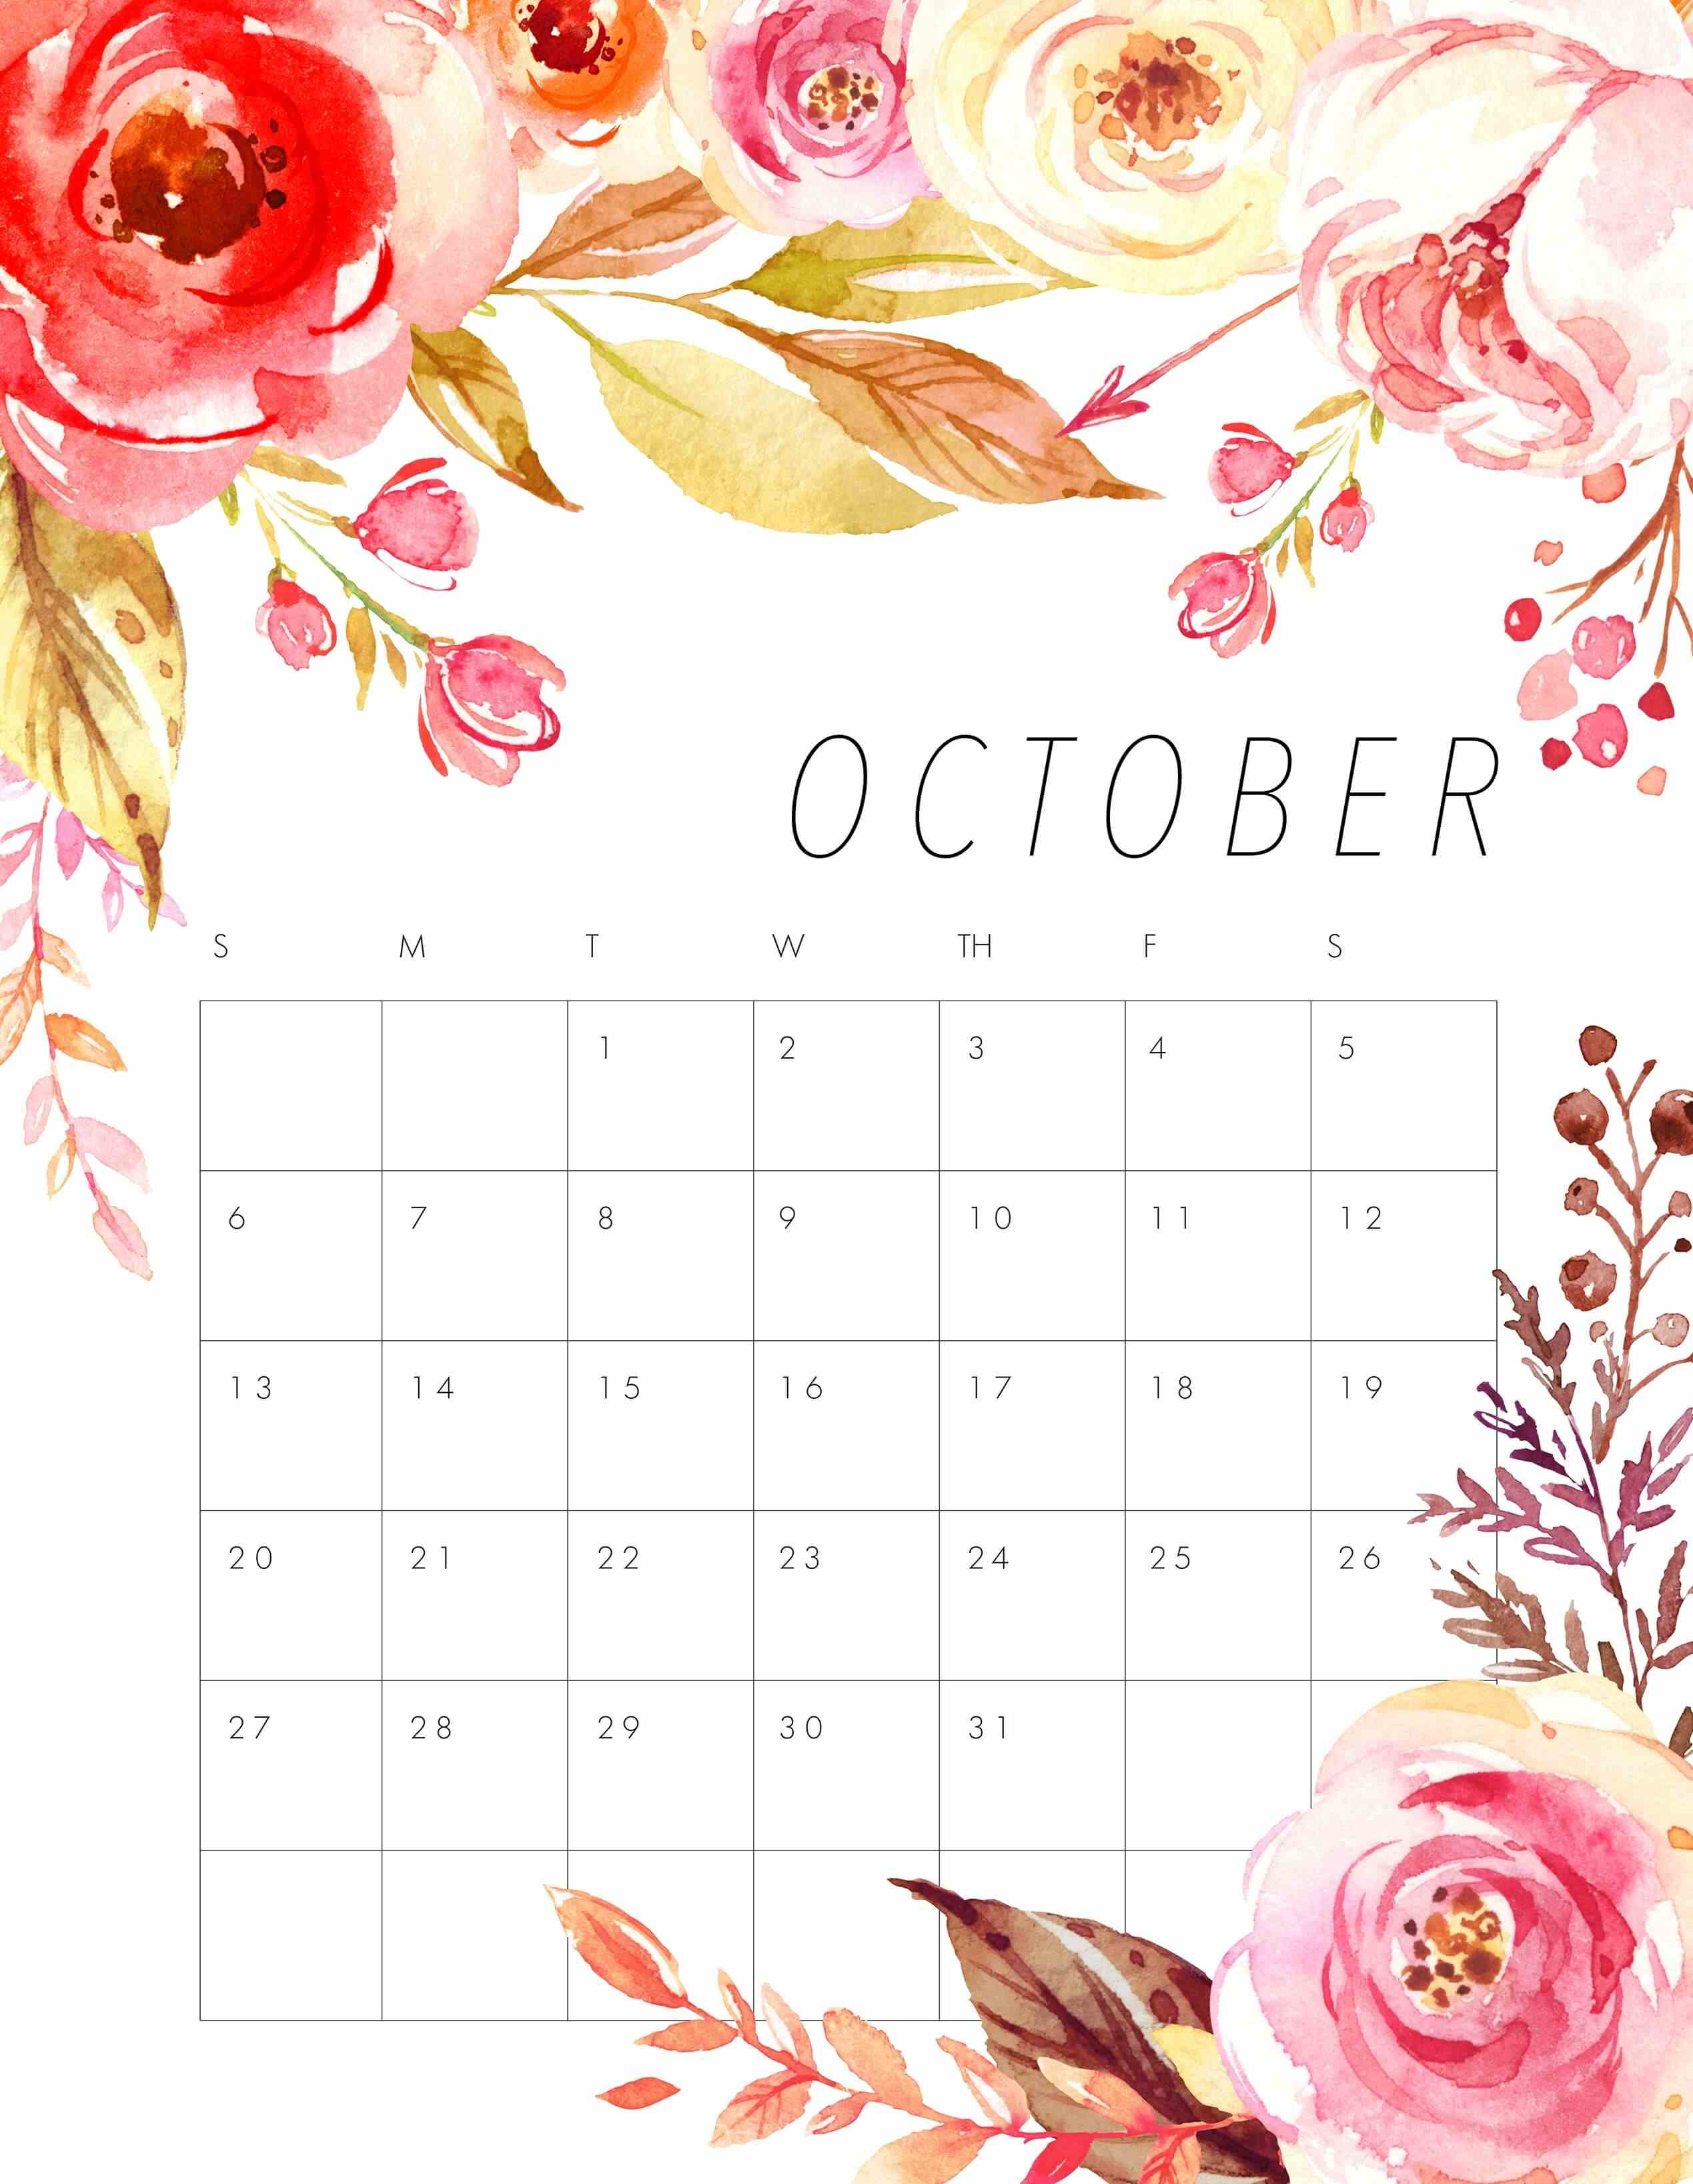 Cute October 2019 Floral Calendar